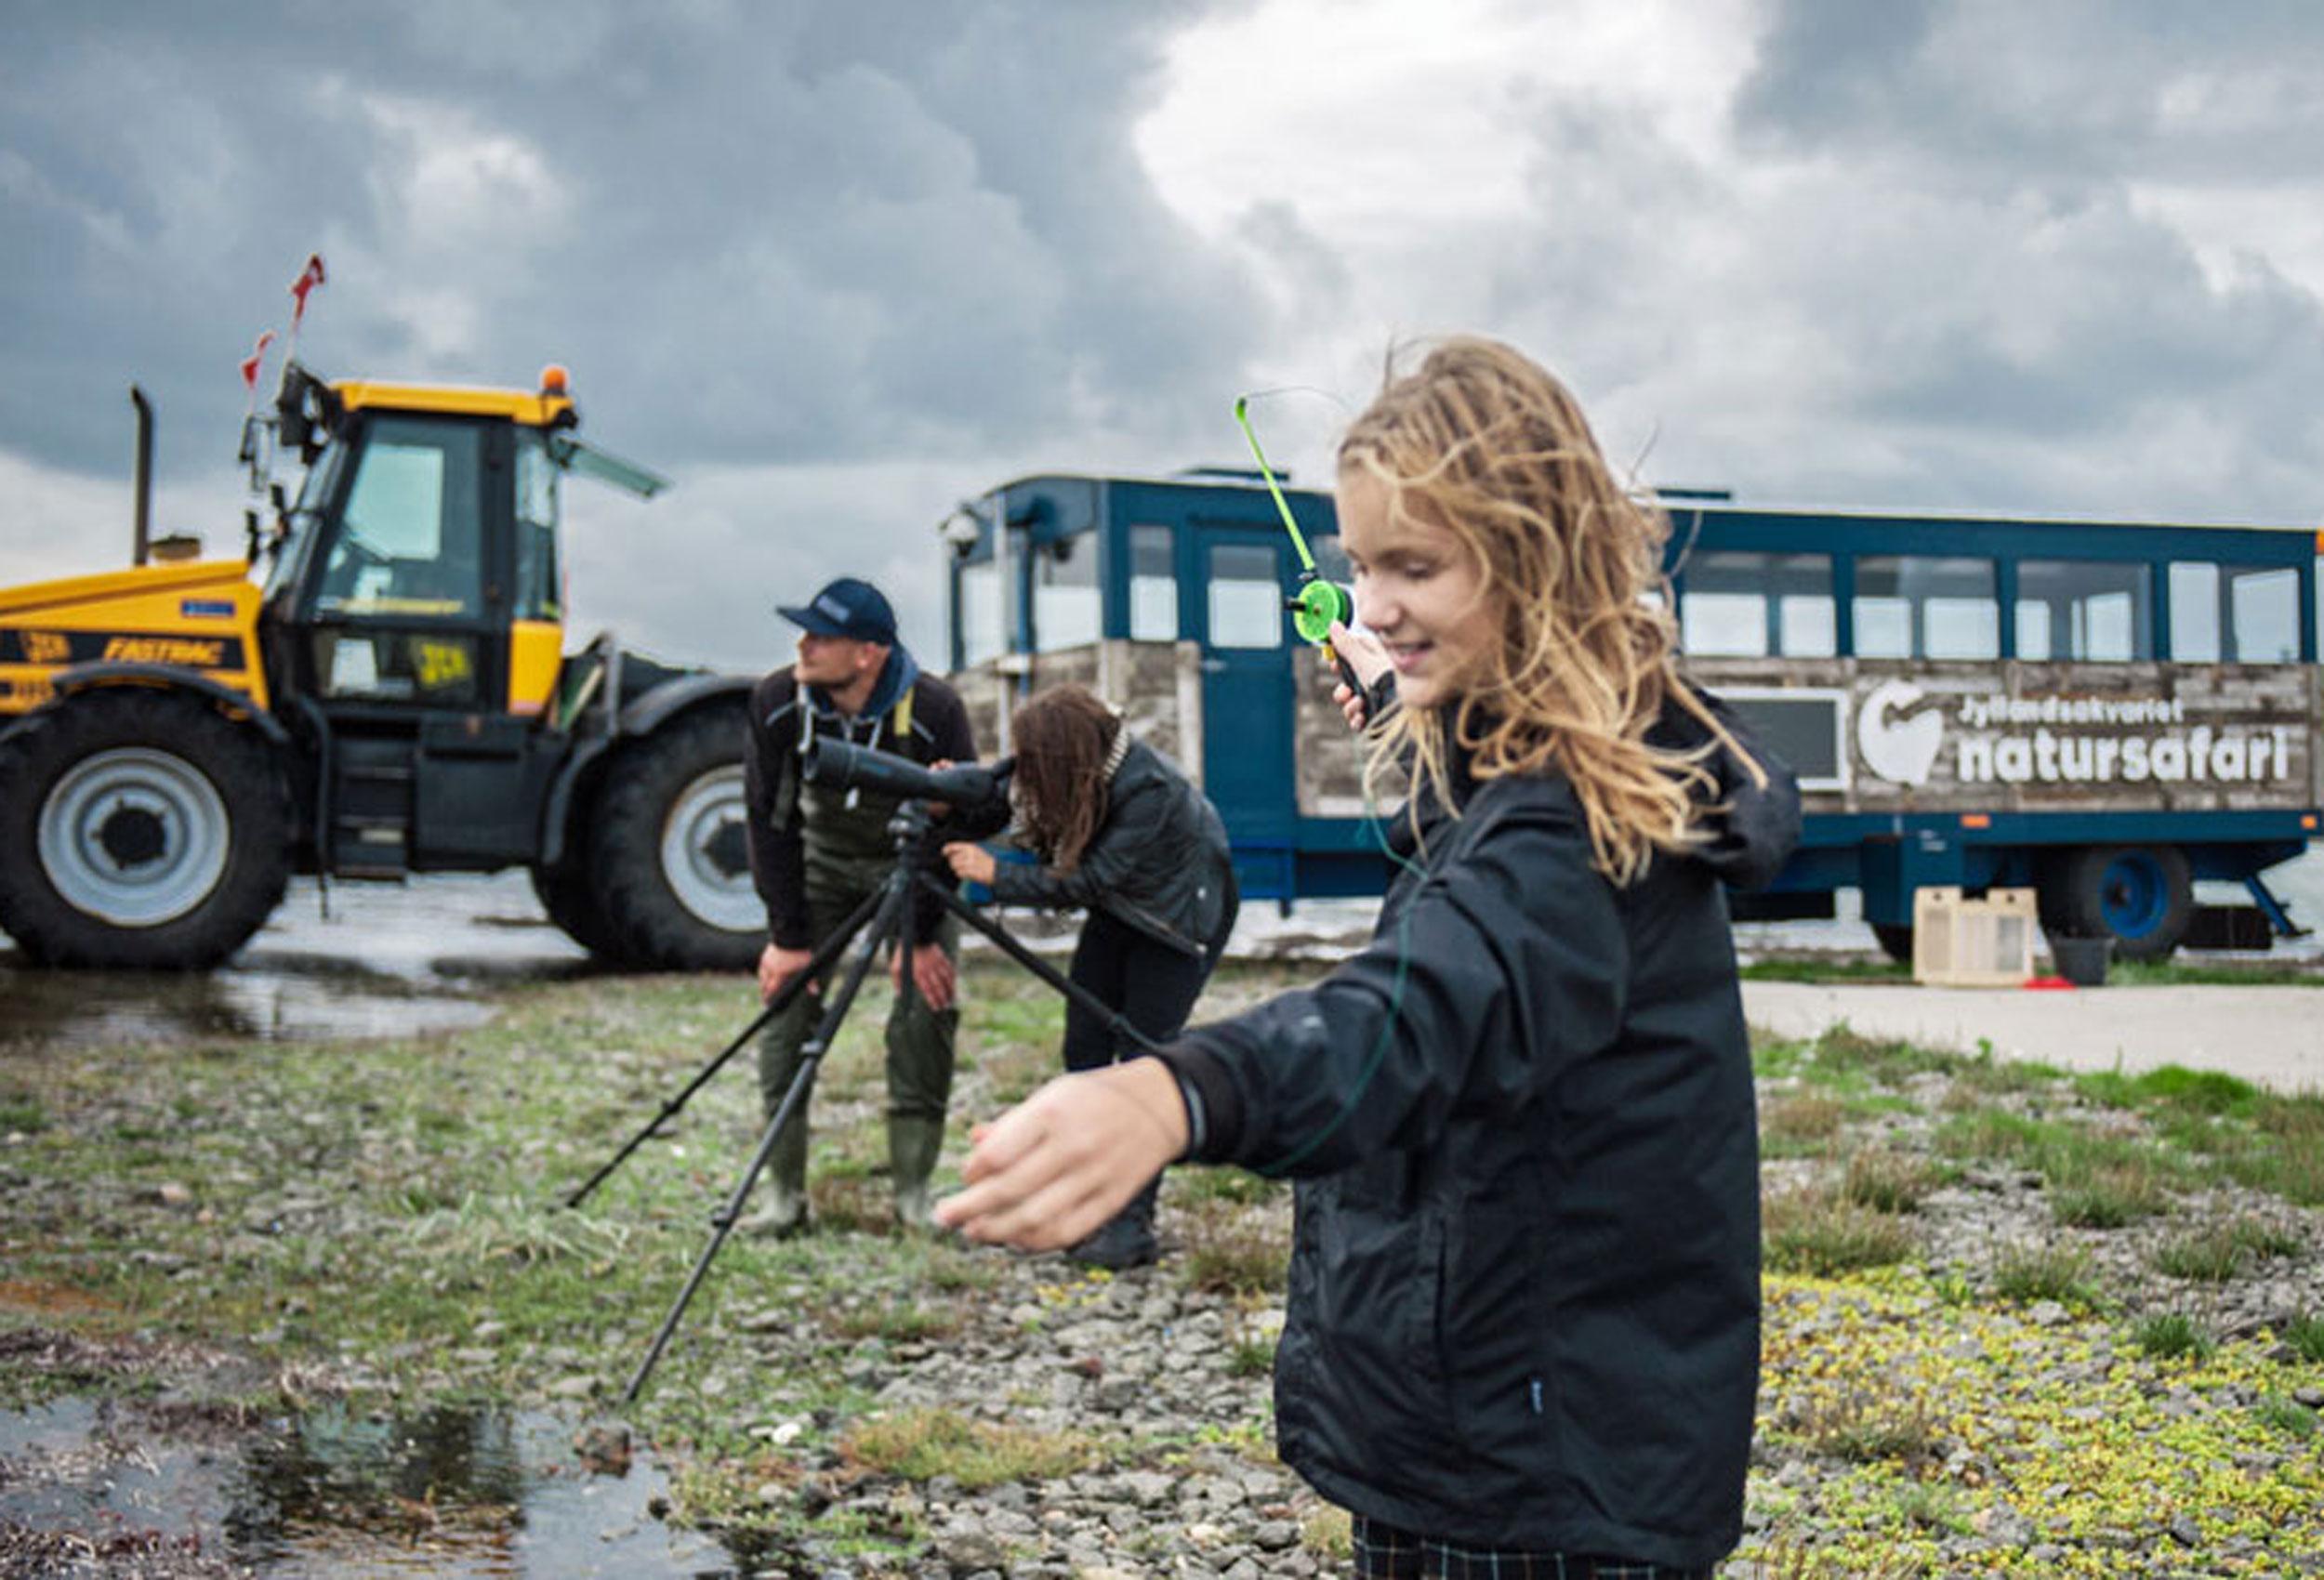 Tag med JyllandsAkvariet på safari